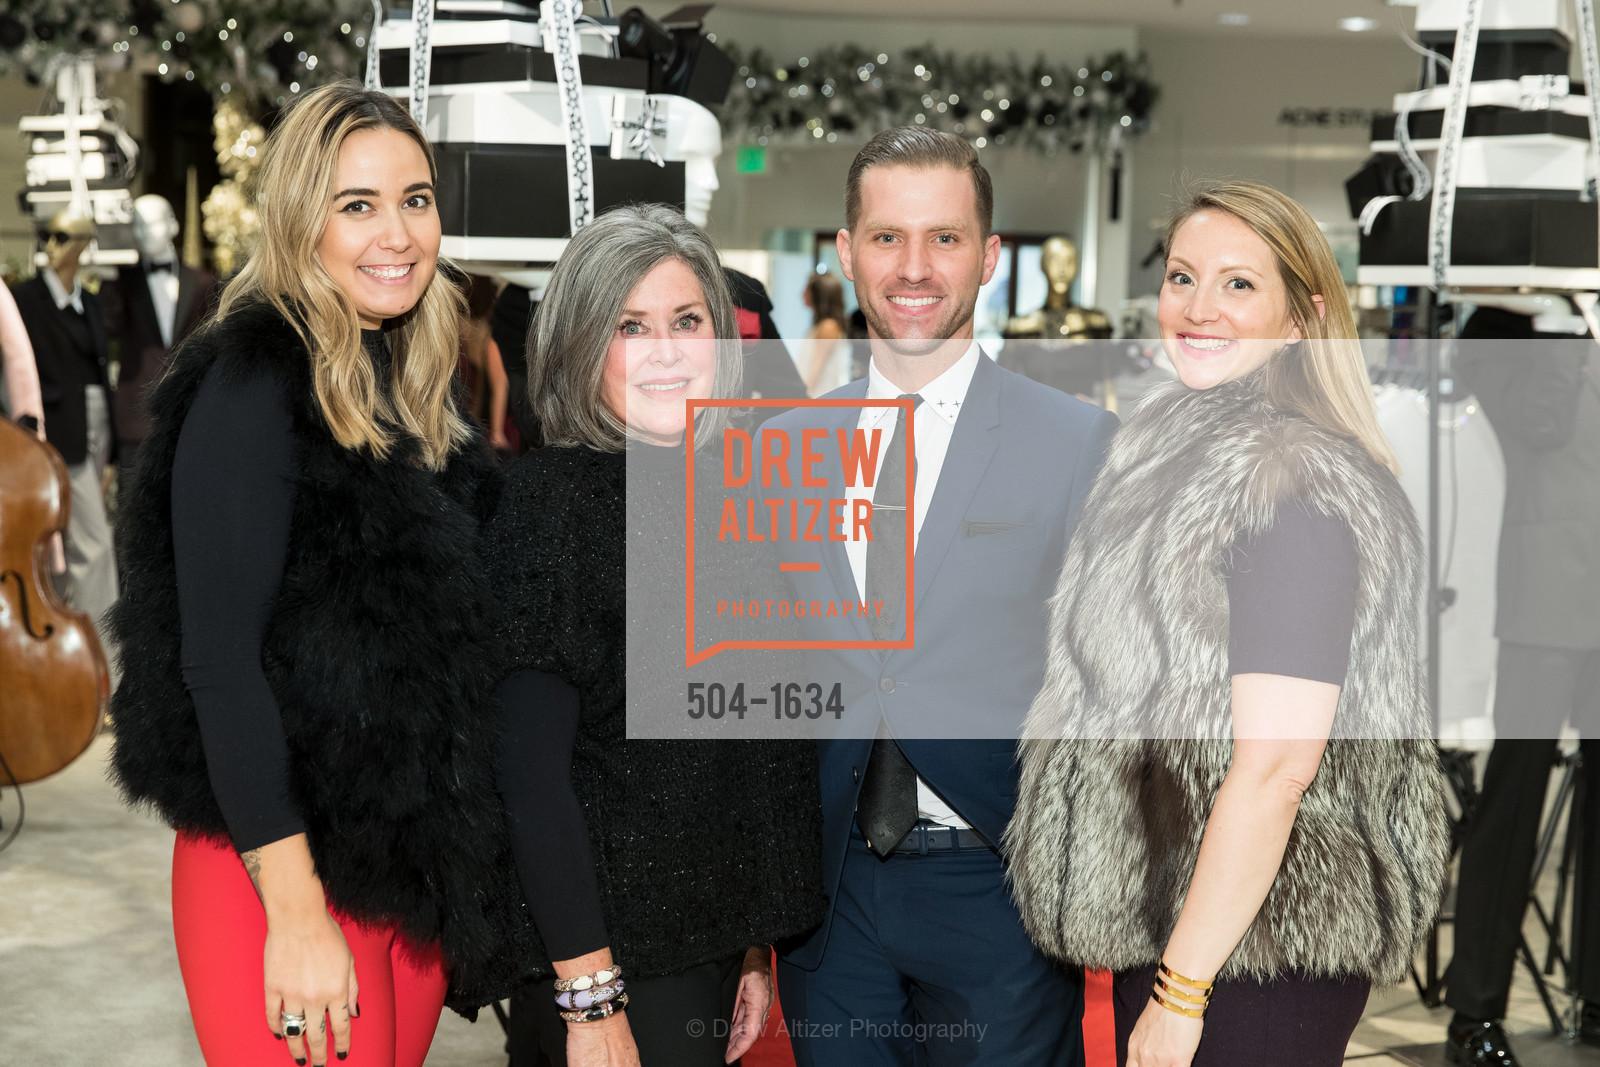 Susan Paganini, Corey Thomas, Lydia Seifert, Saks Fifth Avenue Private Shopping Night, Saks Fifth Avenue. 384 Post St, December 7th, 2016